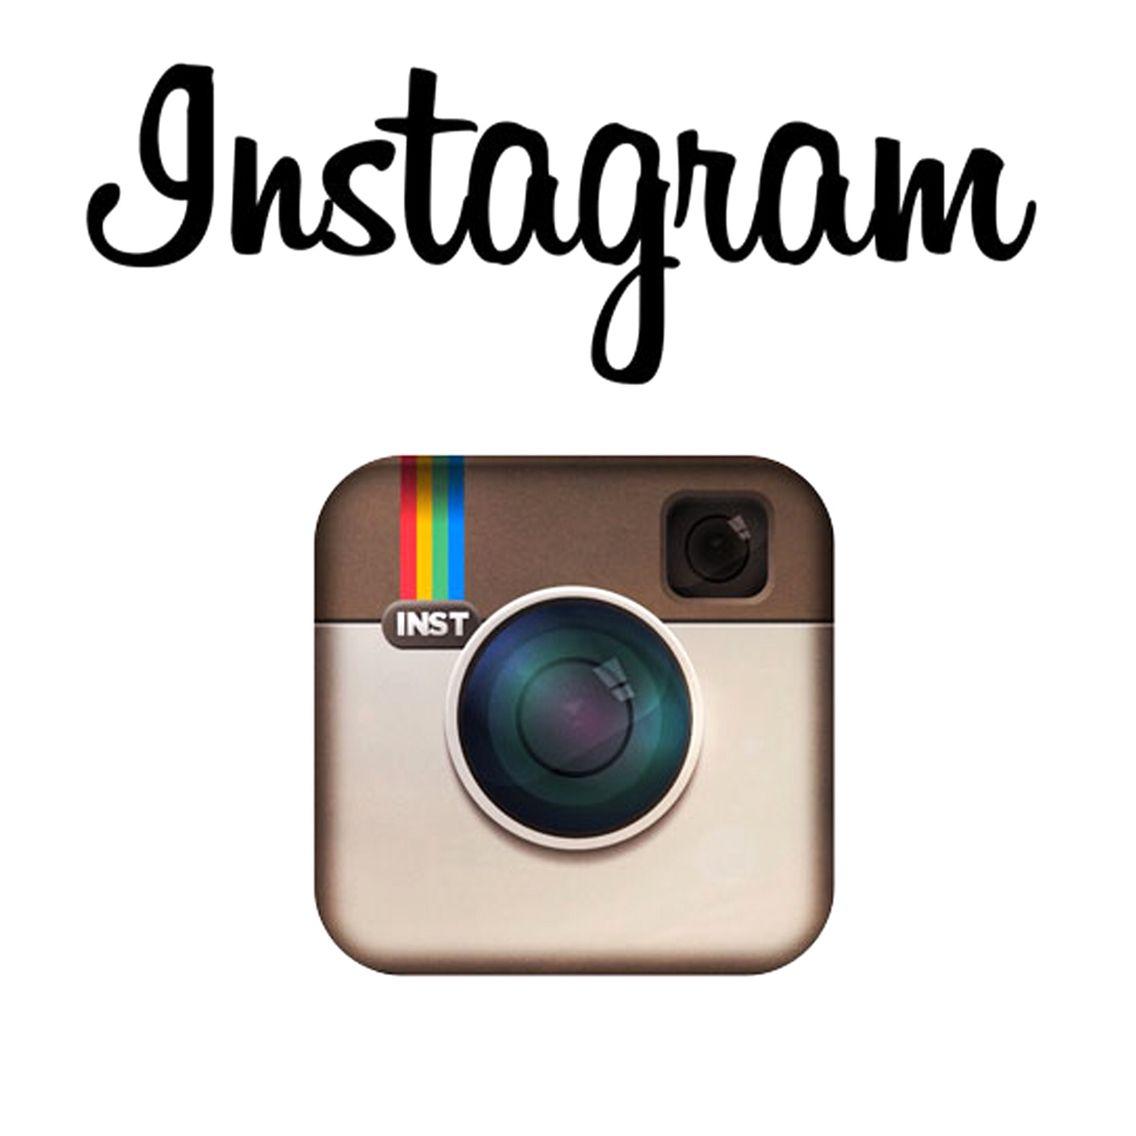 Volg jij ons al op Instagram? zus_en_zo_oostburg